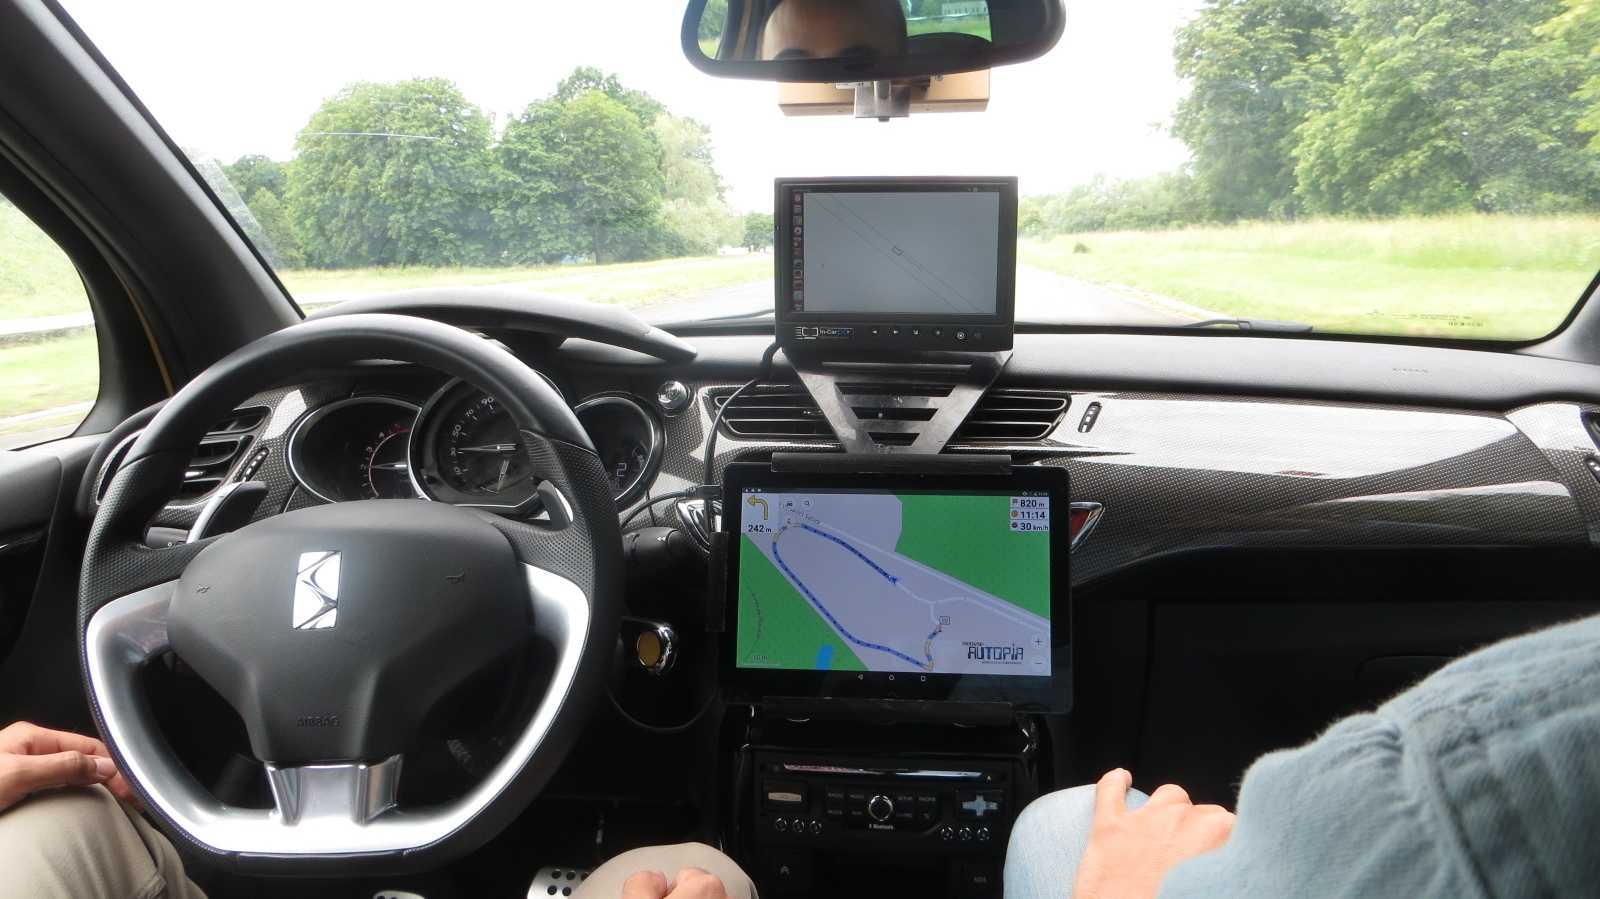 Intelligent Vehicles: Wer braucht autonome Fahrzeuge?